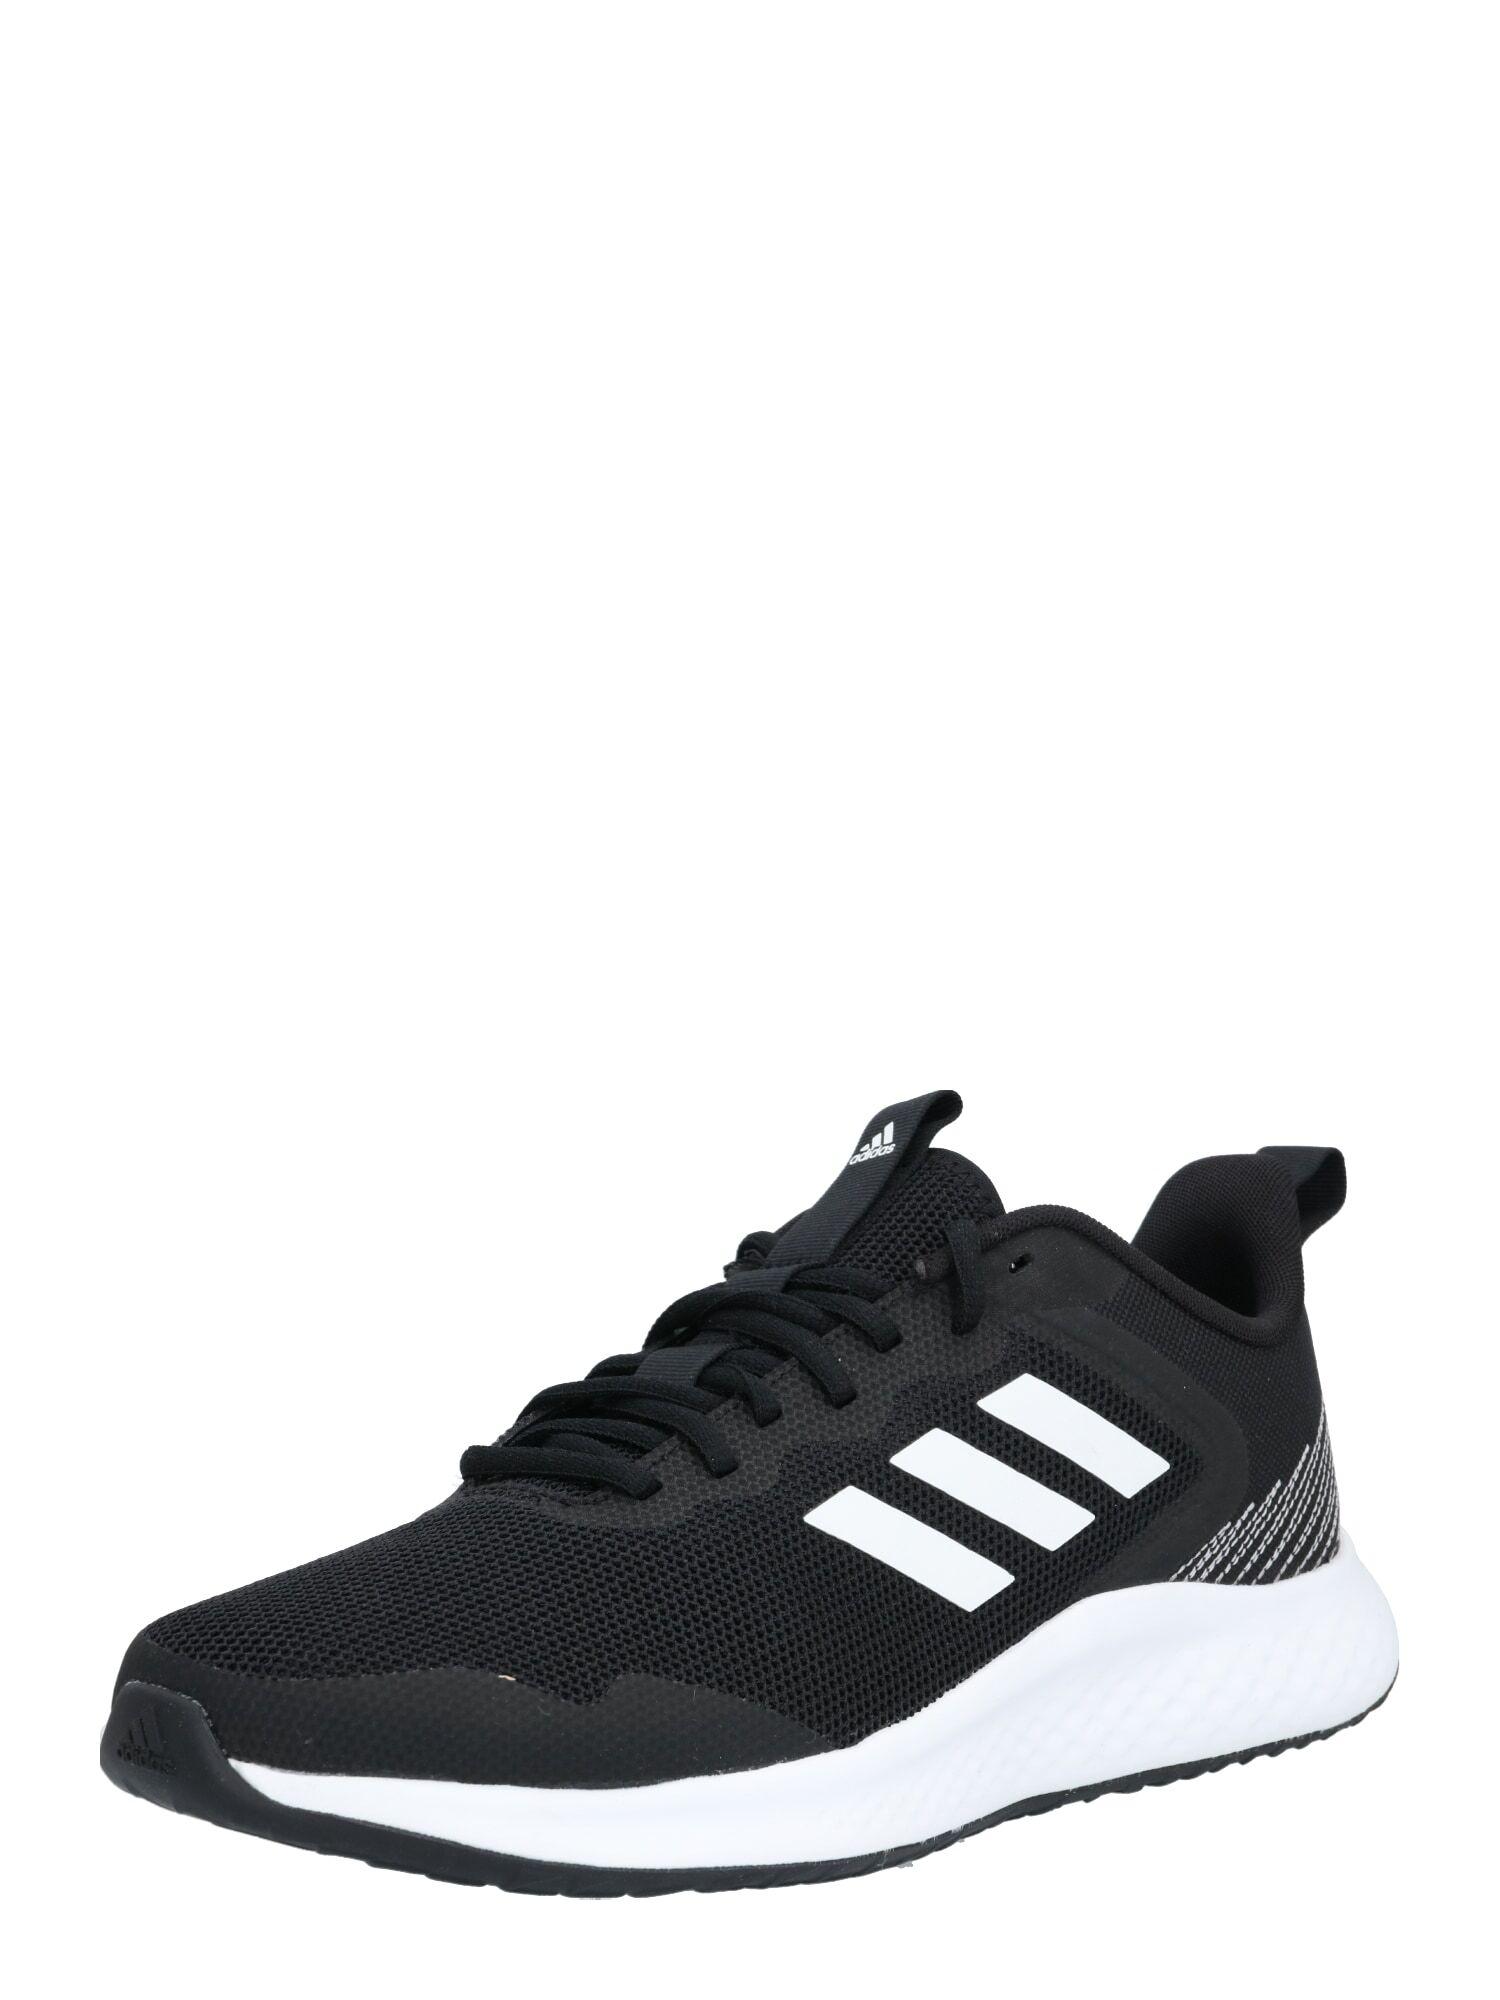 ADIDAS PERFORMANCE Chaussure de course 'Fluid Street'  - Noir - Taille: 8 - male